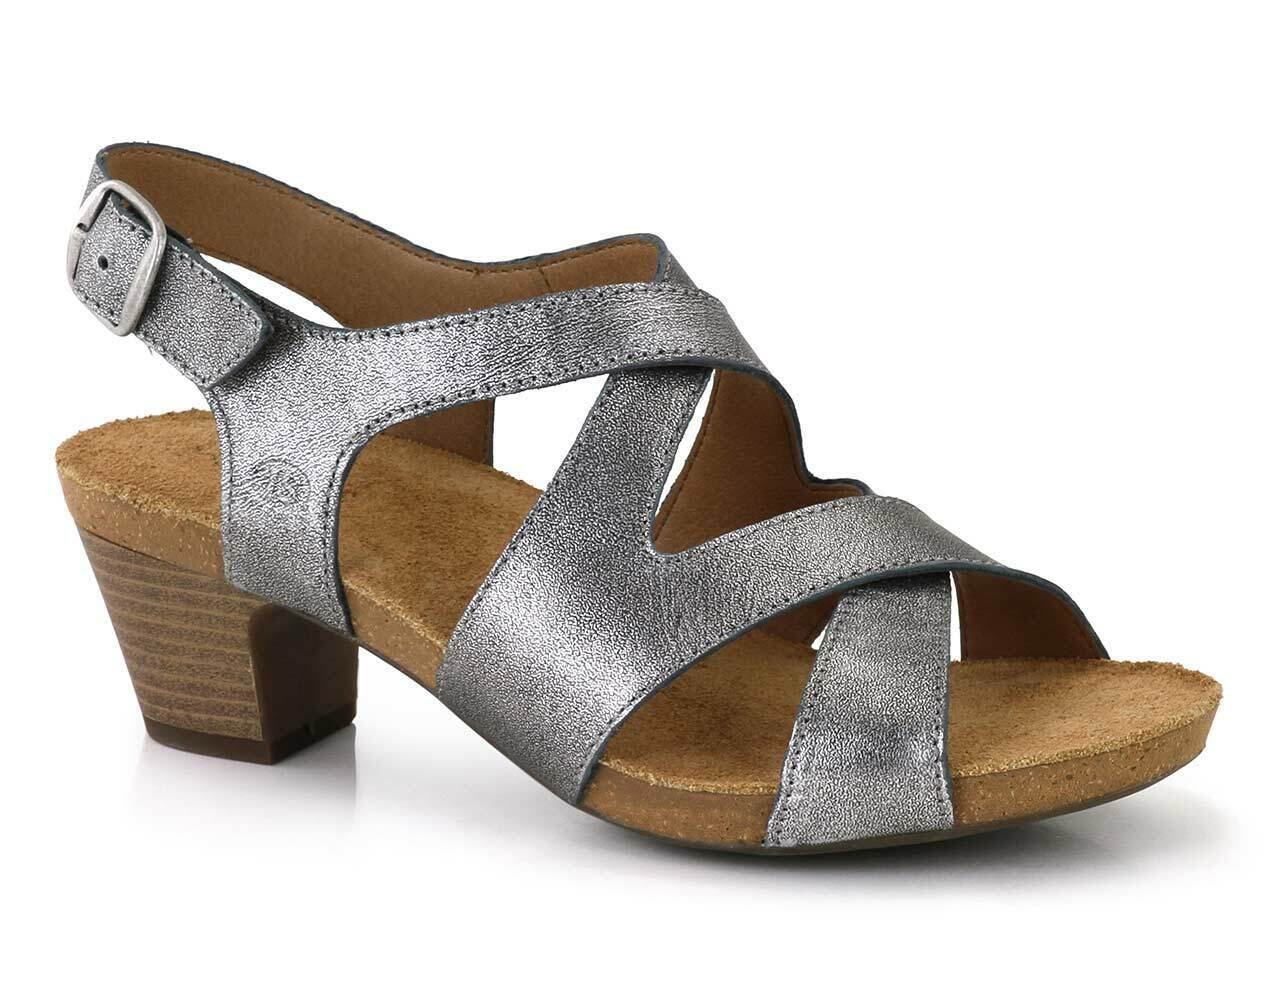 Josef Seidel Ruth 15 Womens Ladies Ankle Strap Buckle Sandals Metallic UK 6 - 7